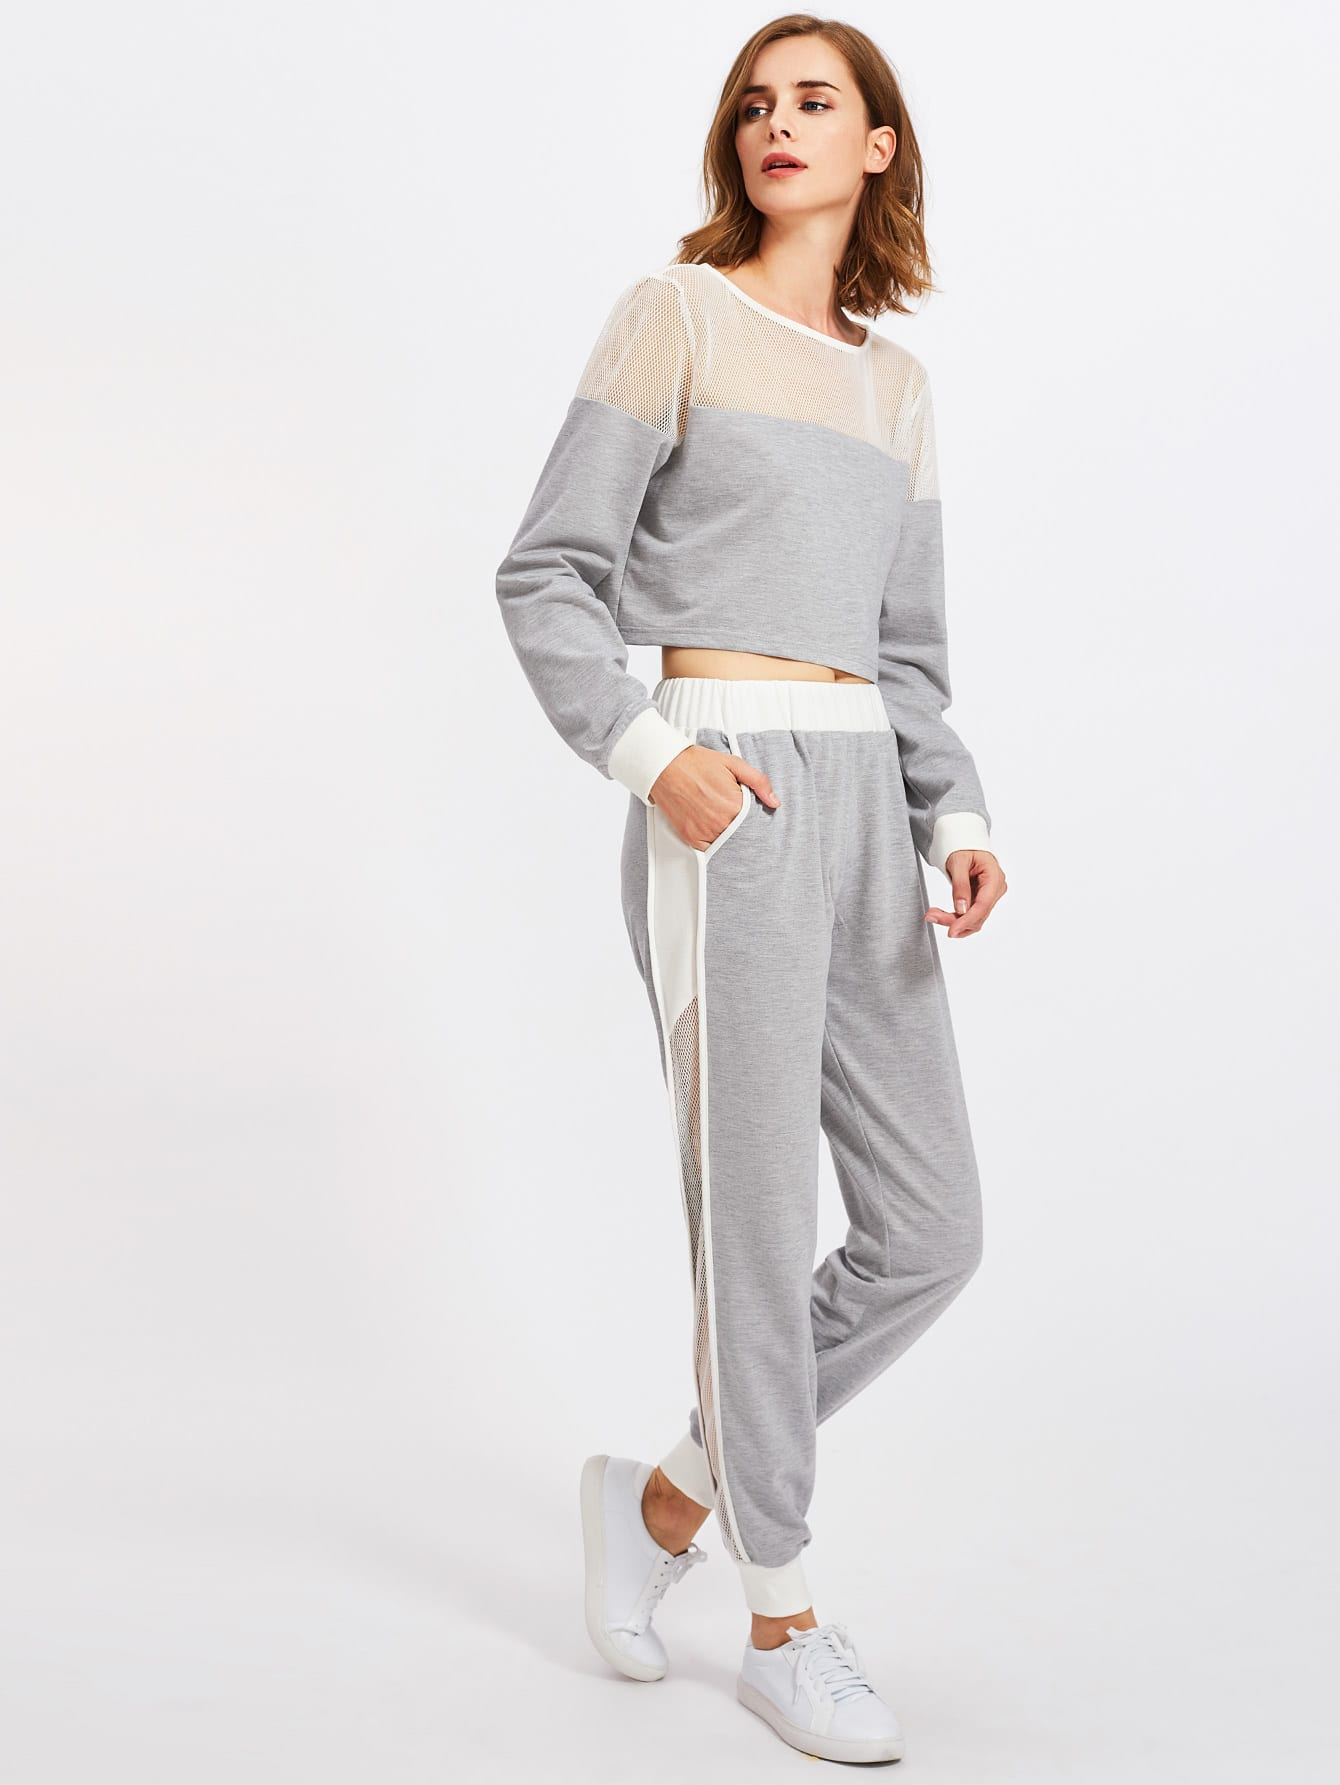 Fishnet Insert Heather Knit Sweatshirt And Pants Set contrast ruffle trim heather knit sweatshirt